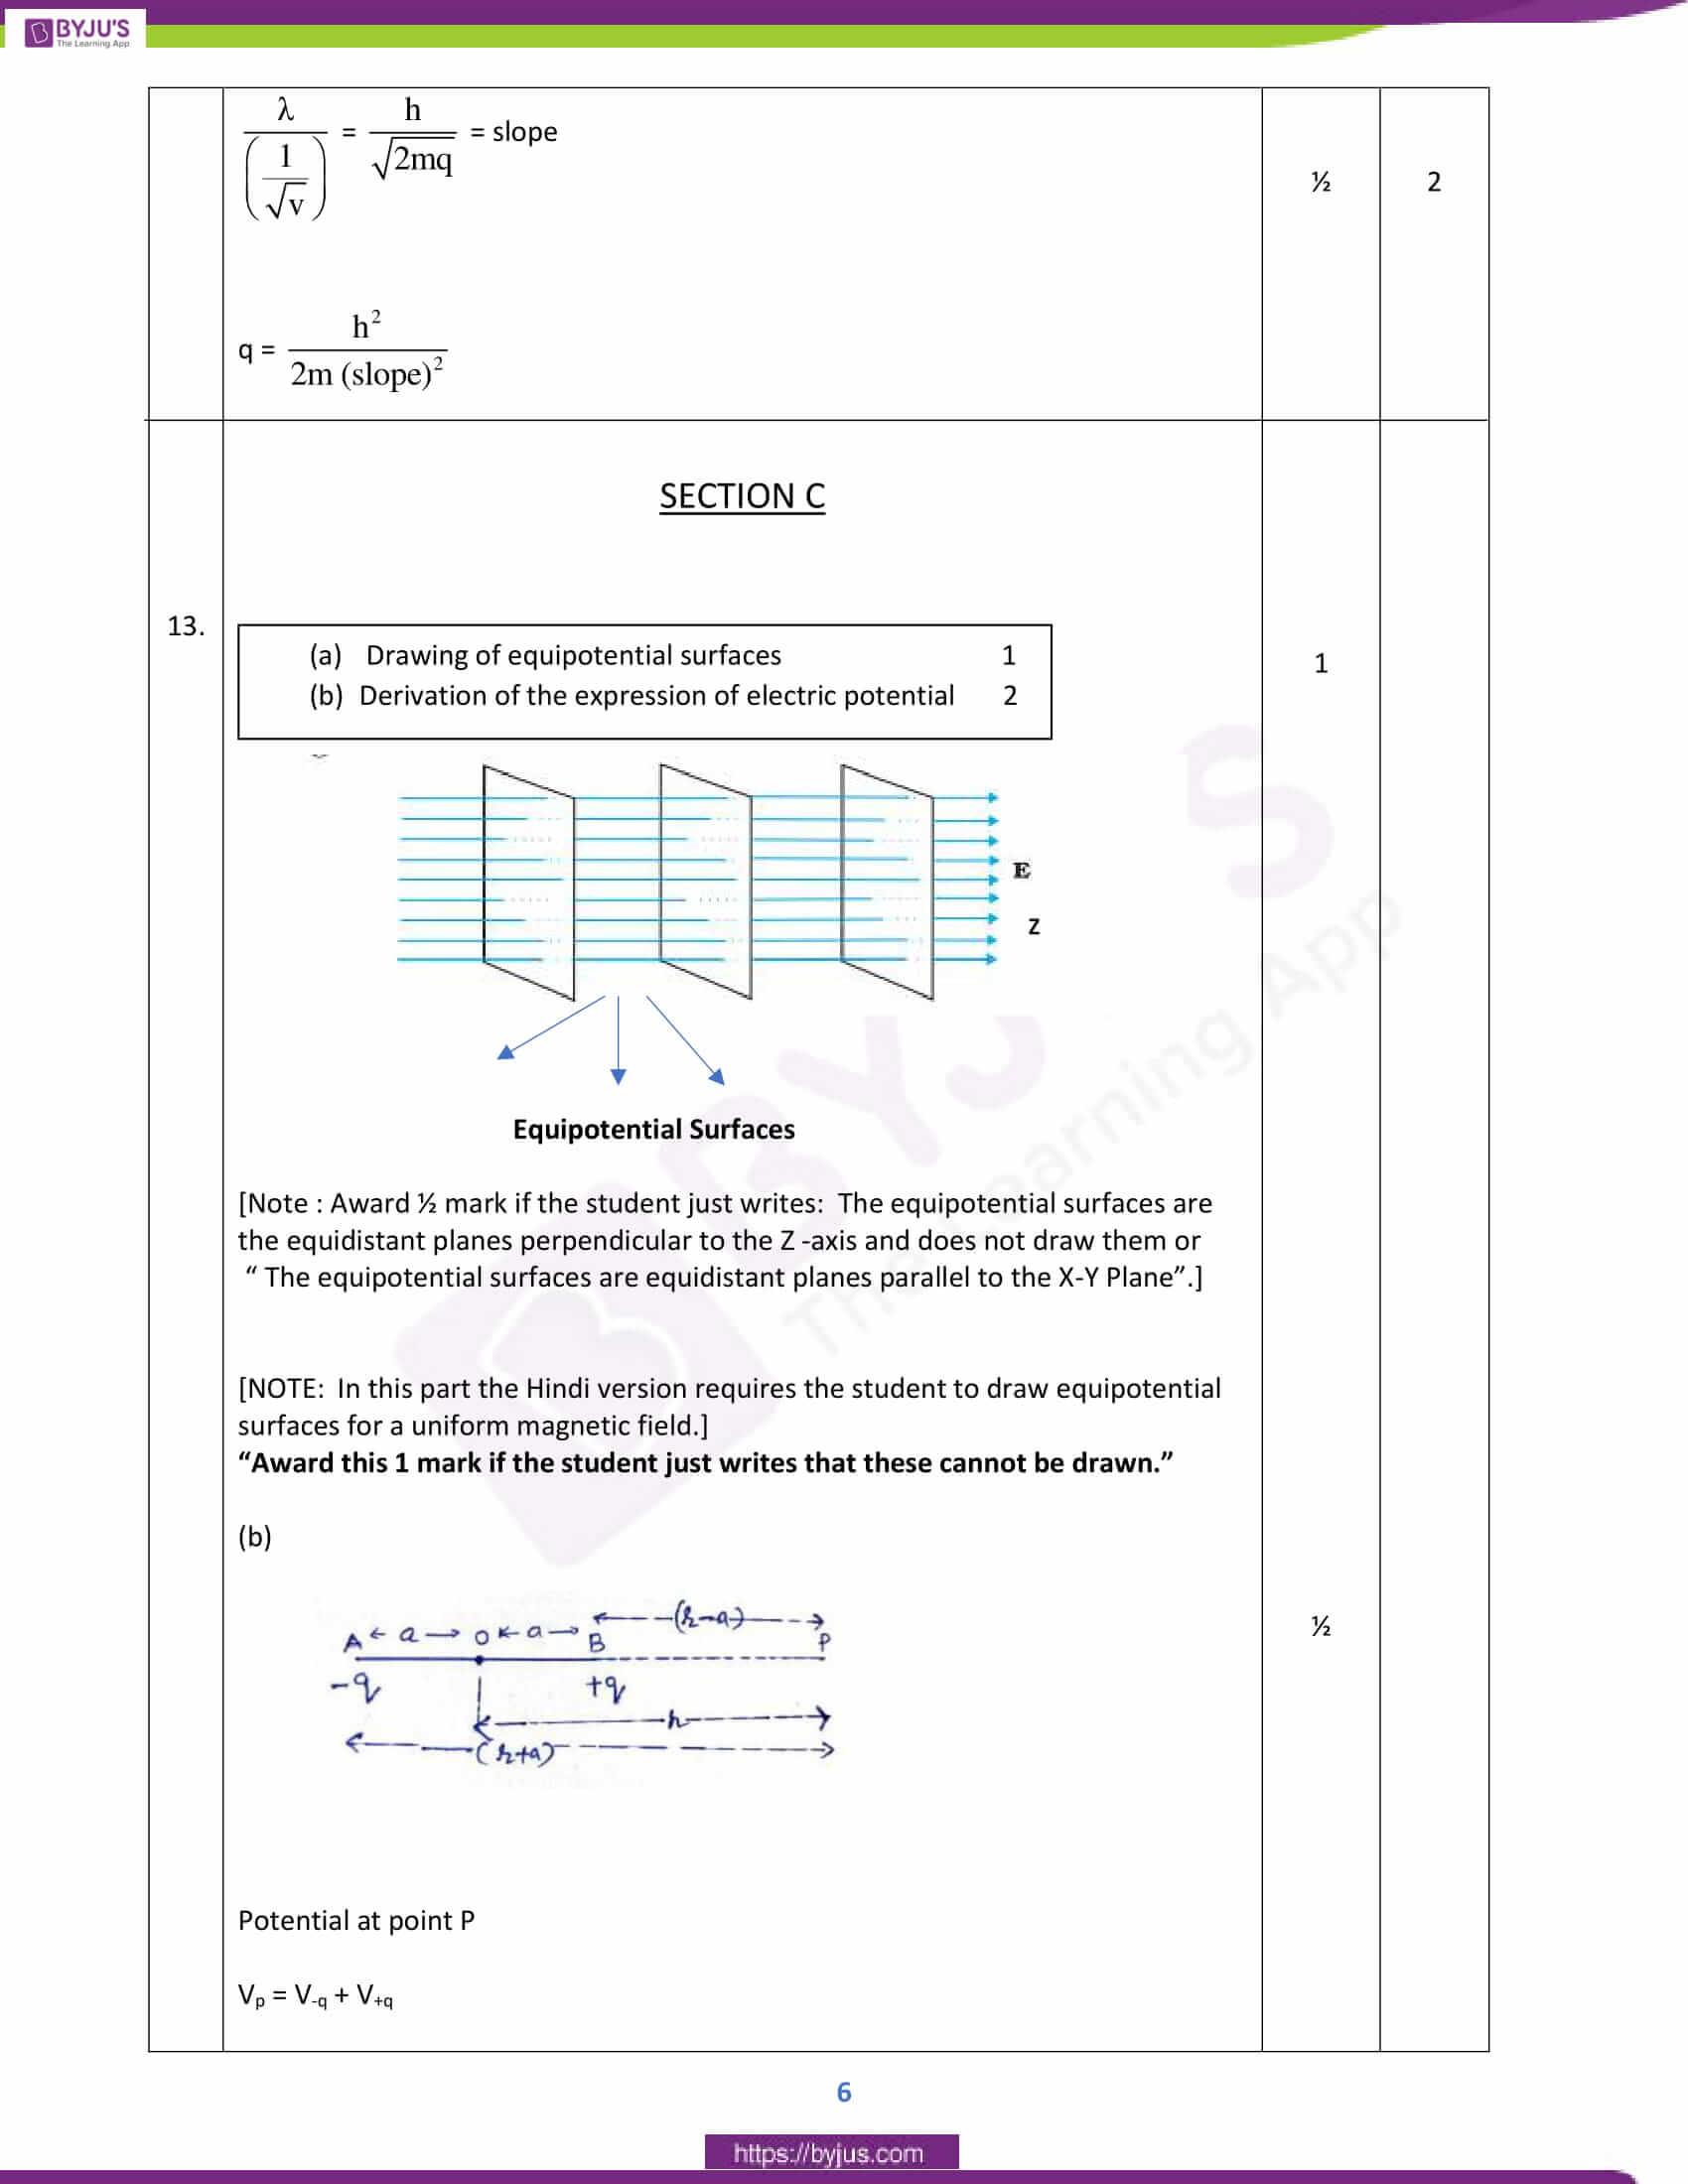 cbse class 12 phy 2019 solution set 1